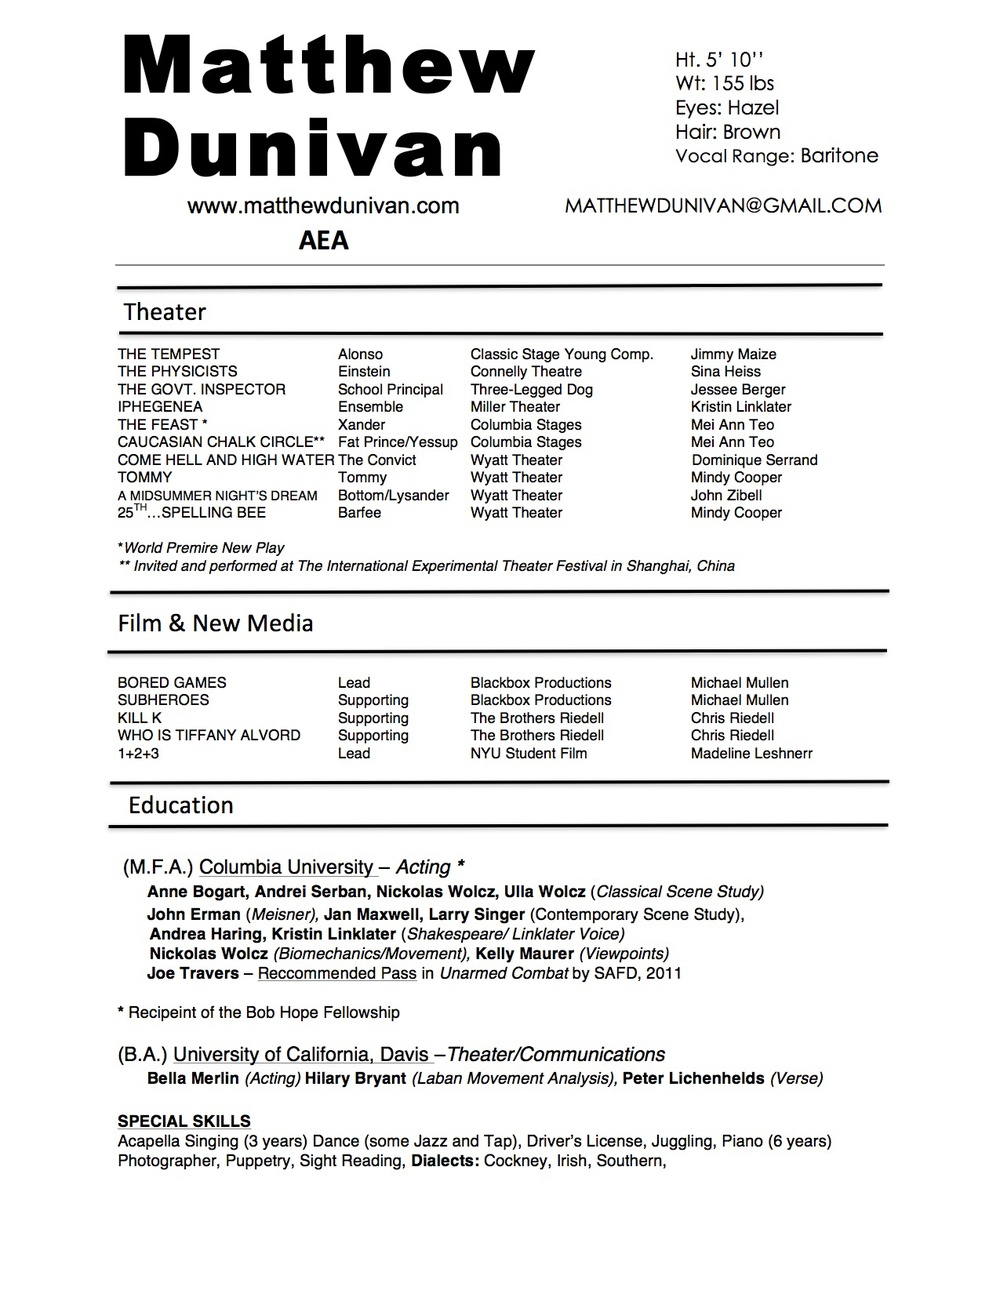 caucasian chalk circle summary pdf